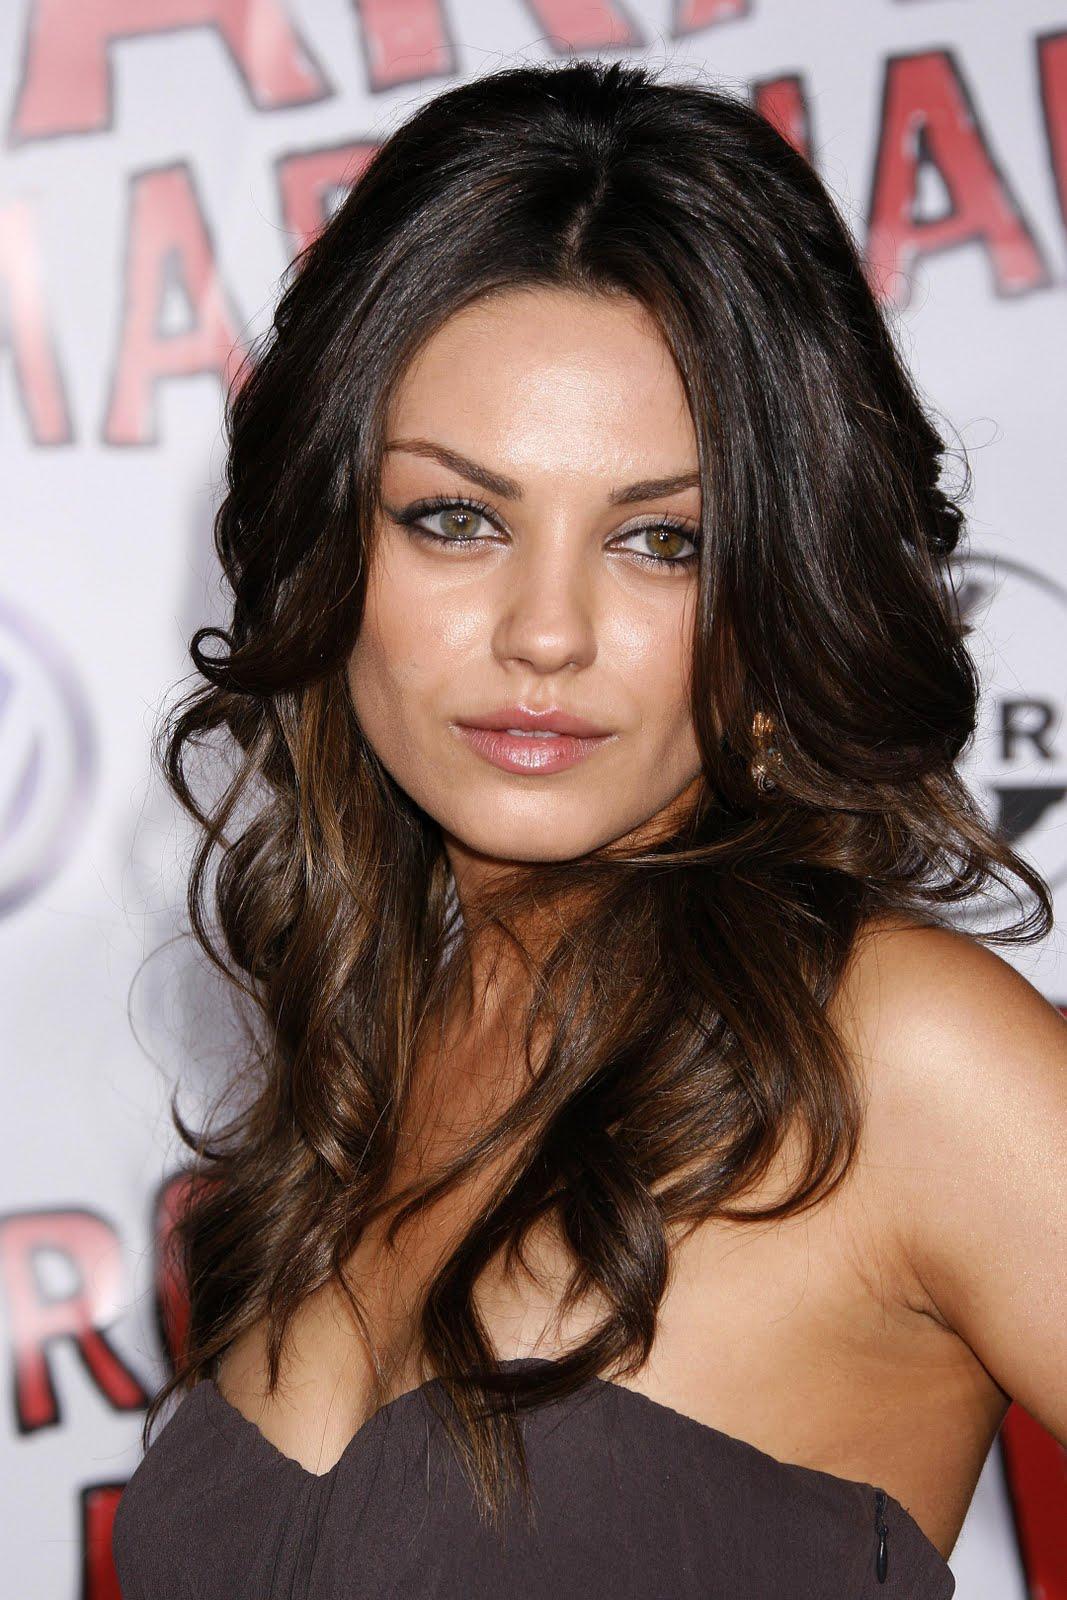 http://1.bp.blogspot.com/-Gre72vf0zm0/TgnpZuRLbTI/AAAAAAAAHks/iiXy36TCH4c/s1600/mila+kunis+sexy+photo.jpg